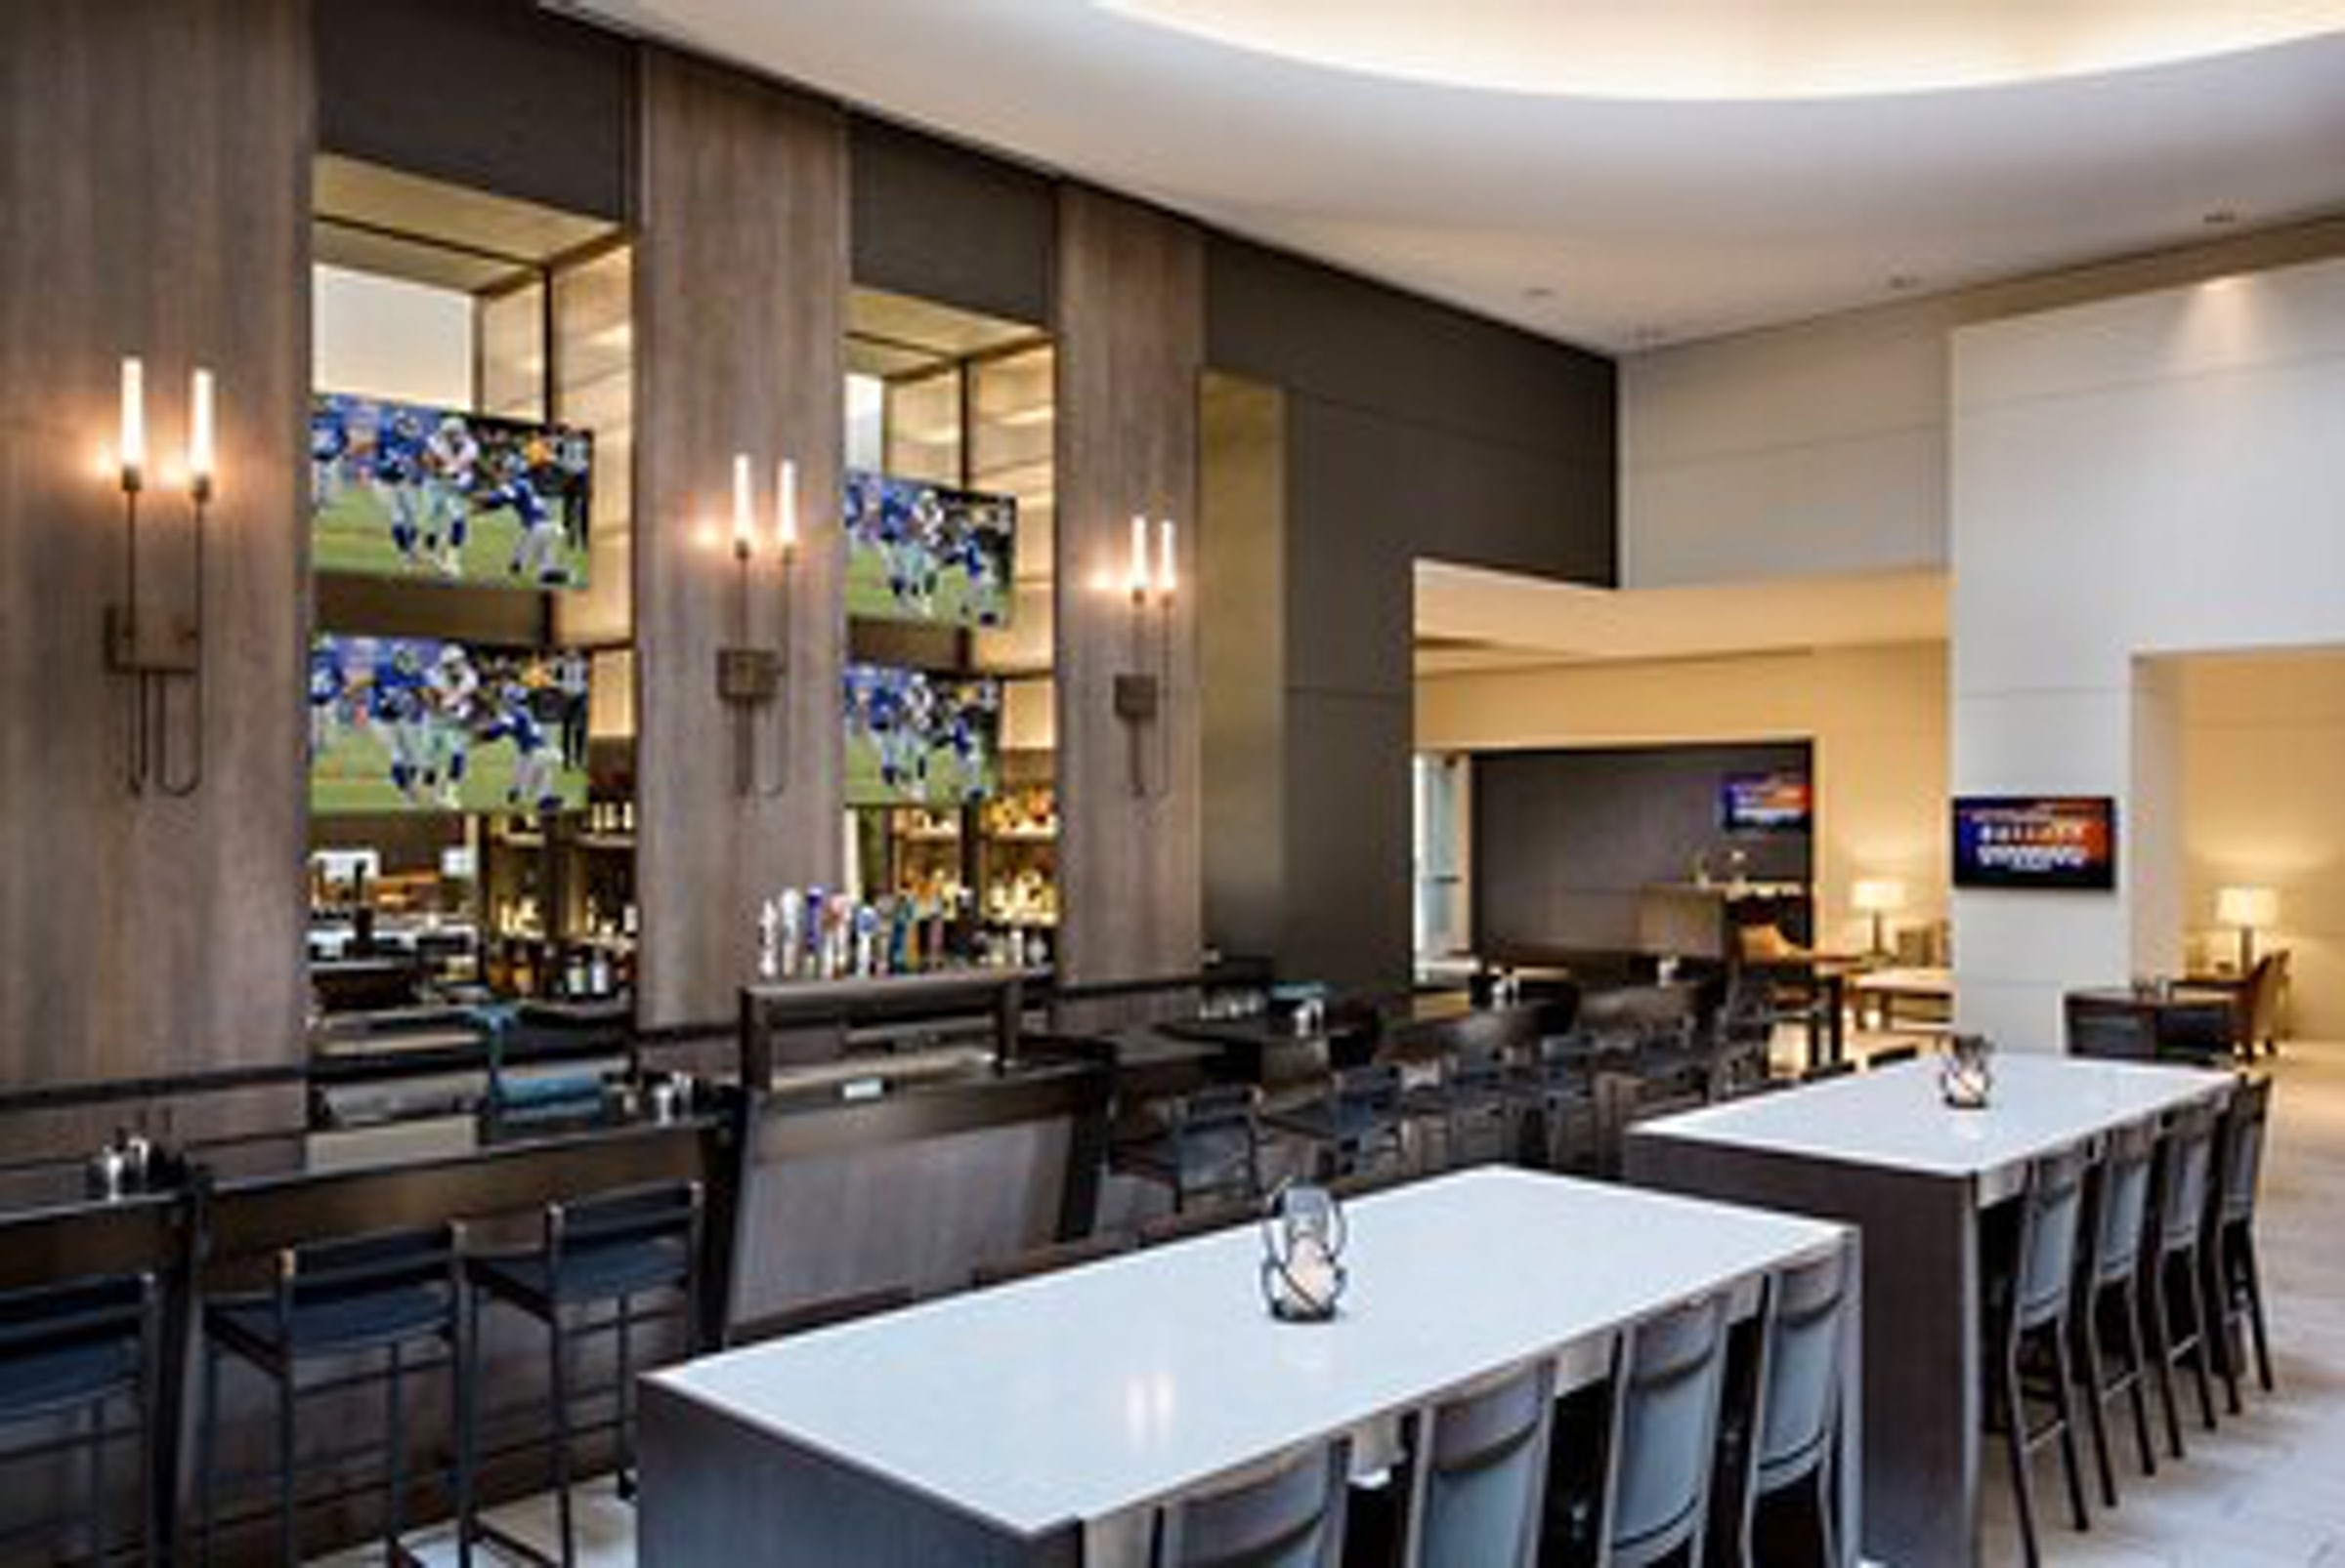 Marriott Dallas/Fort Worth Westlake in Beyond Dallas